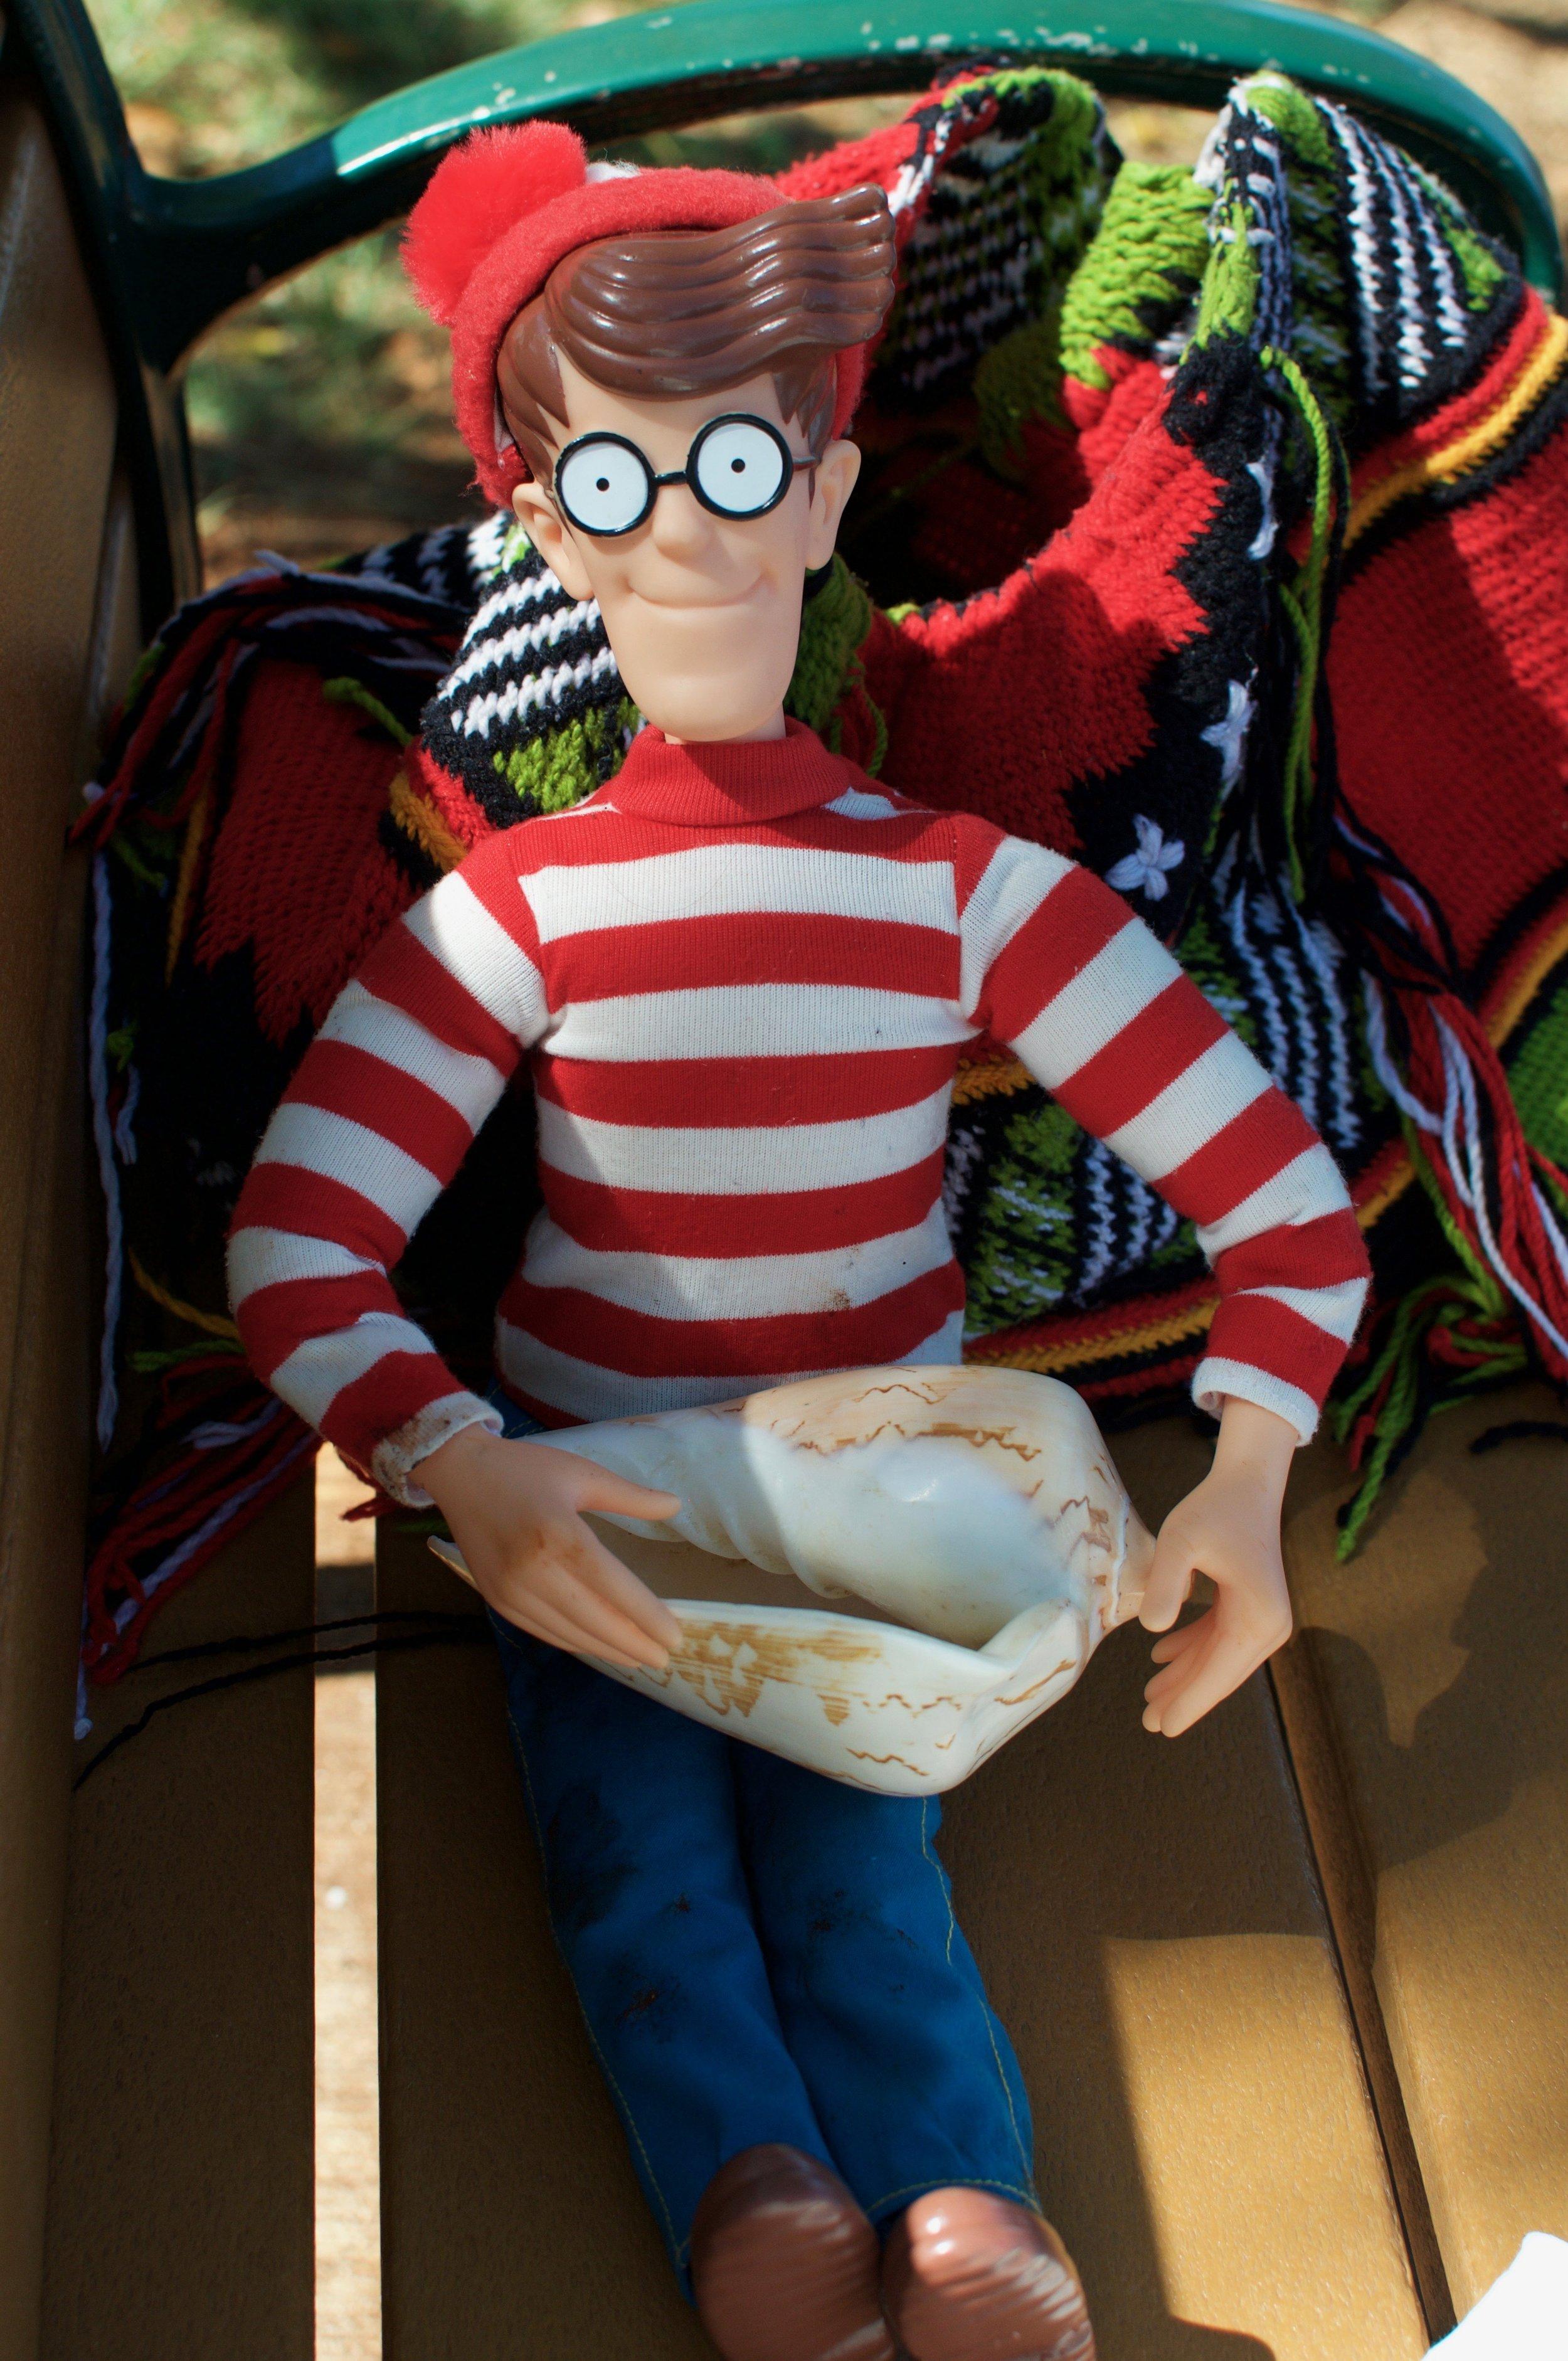 Waldo, my spirit animal